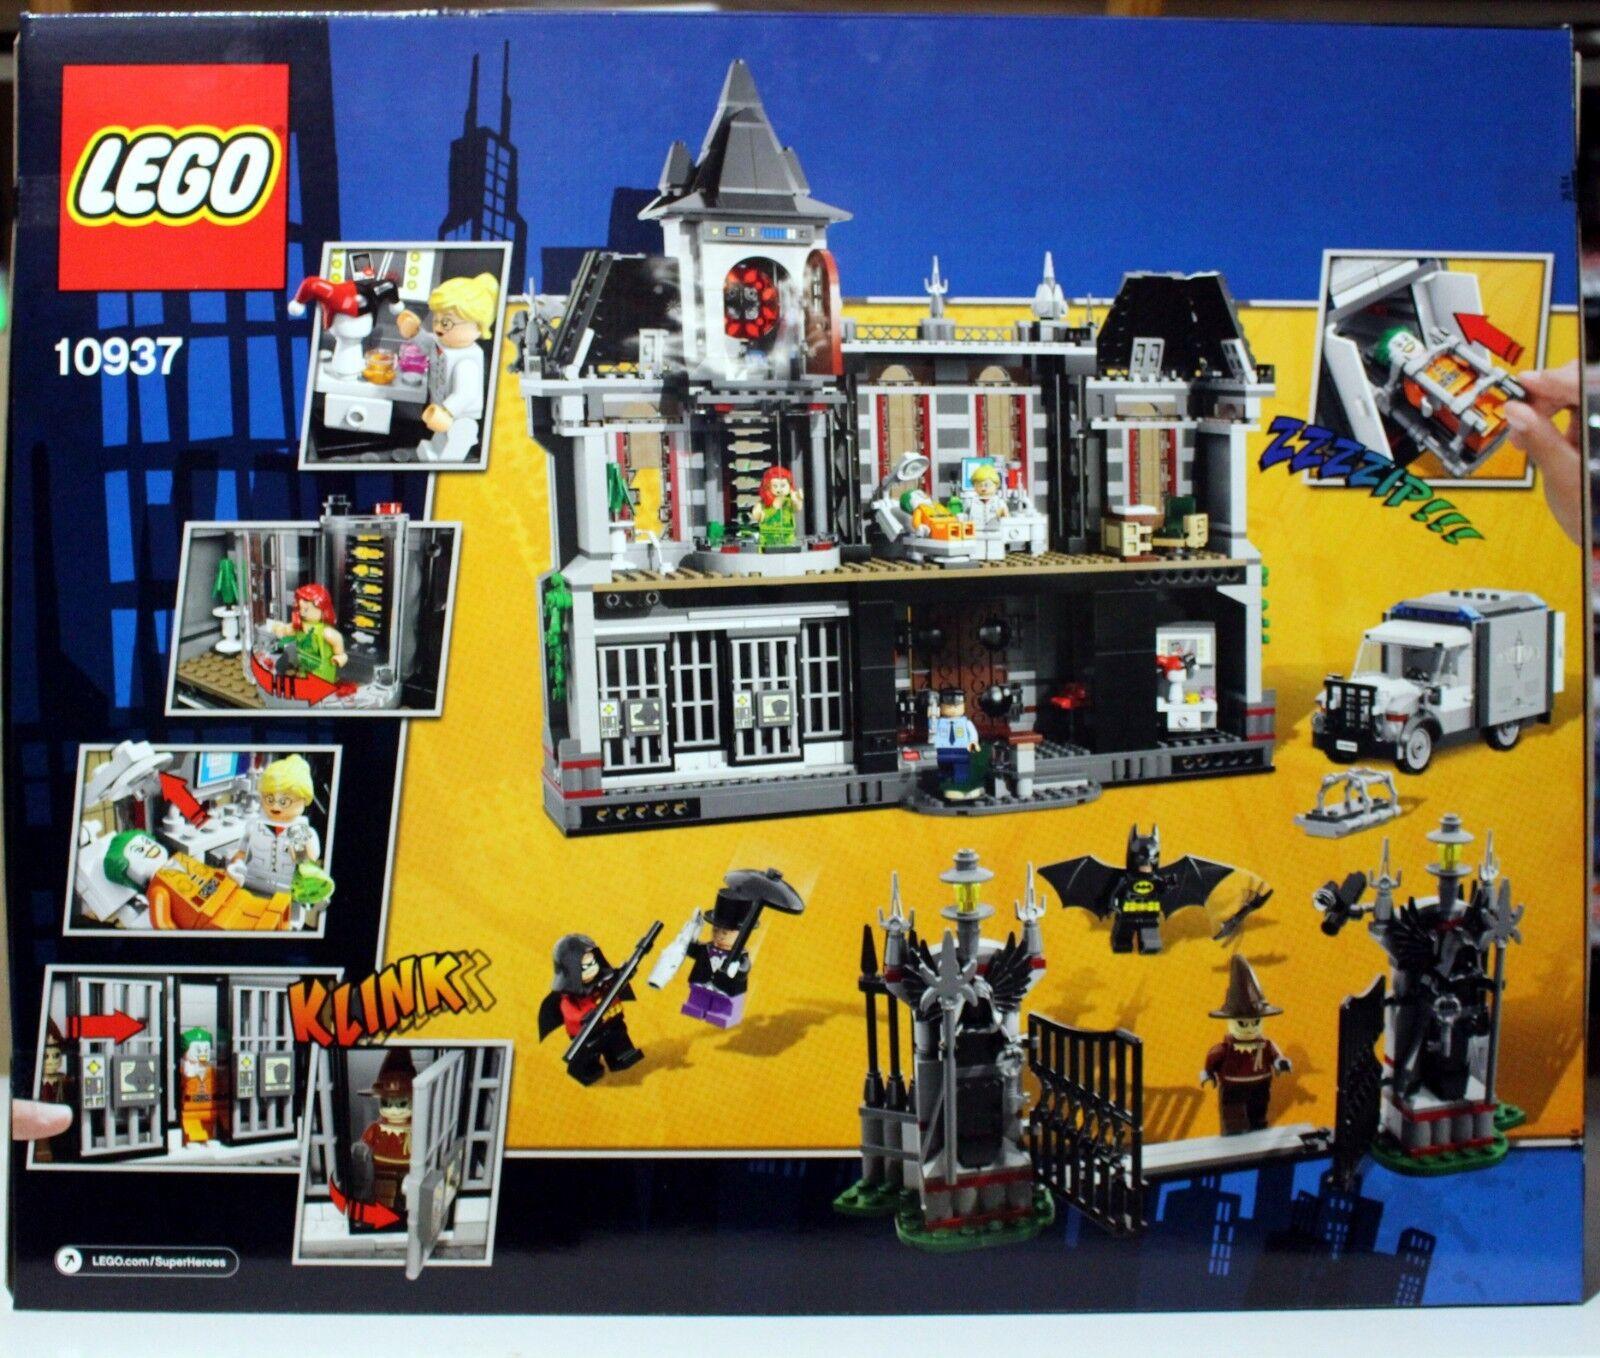 NEW LEGO BATMAN ARKHAM ASYLUM BREAKOUT BREAKOUT BREAKOUT SET 10937 - DC SUPER HEROES - 1619 PIECES 6964b0